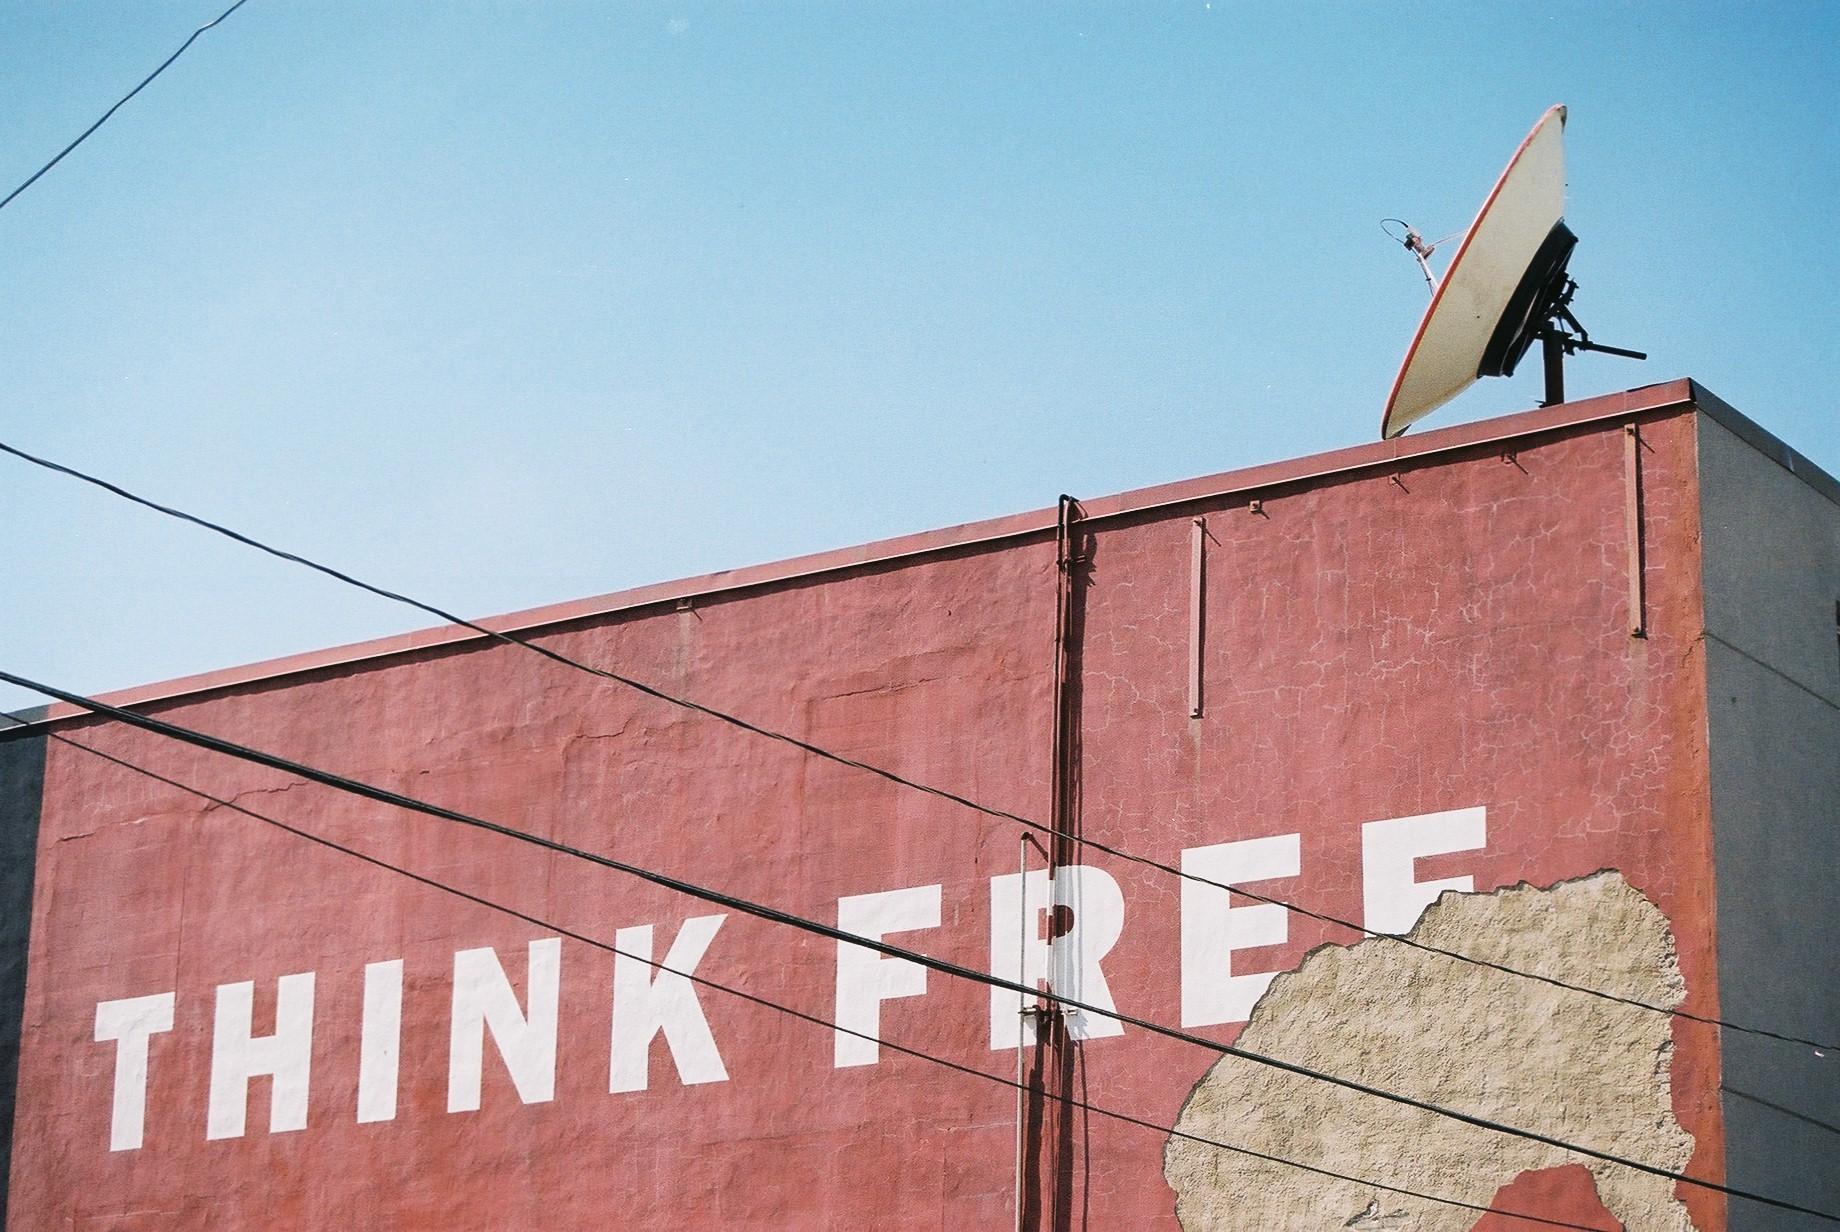 Think Free - (c) 2012 - Toronto Street Photography by Dennis Riebenstahl